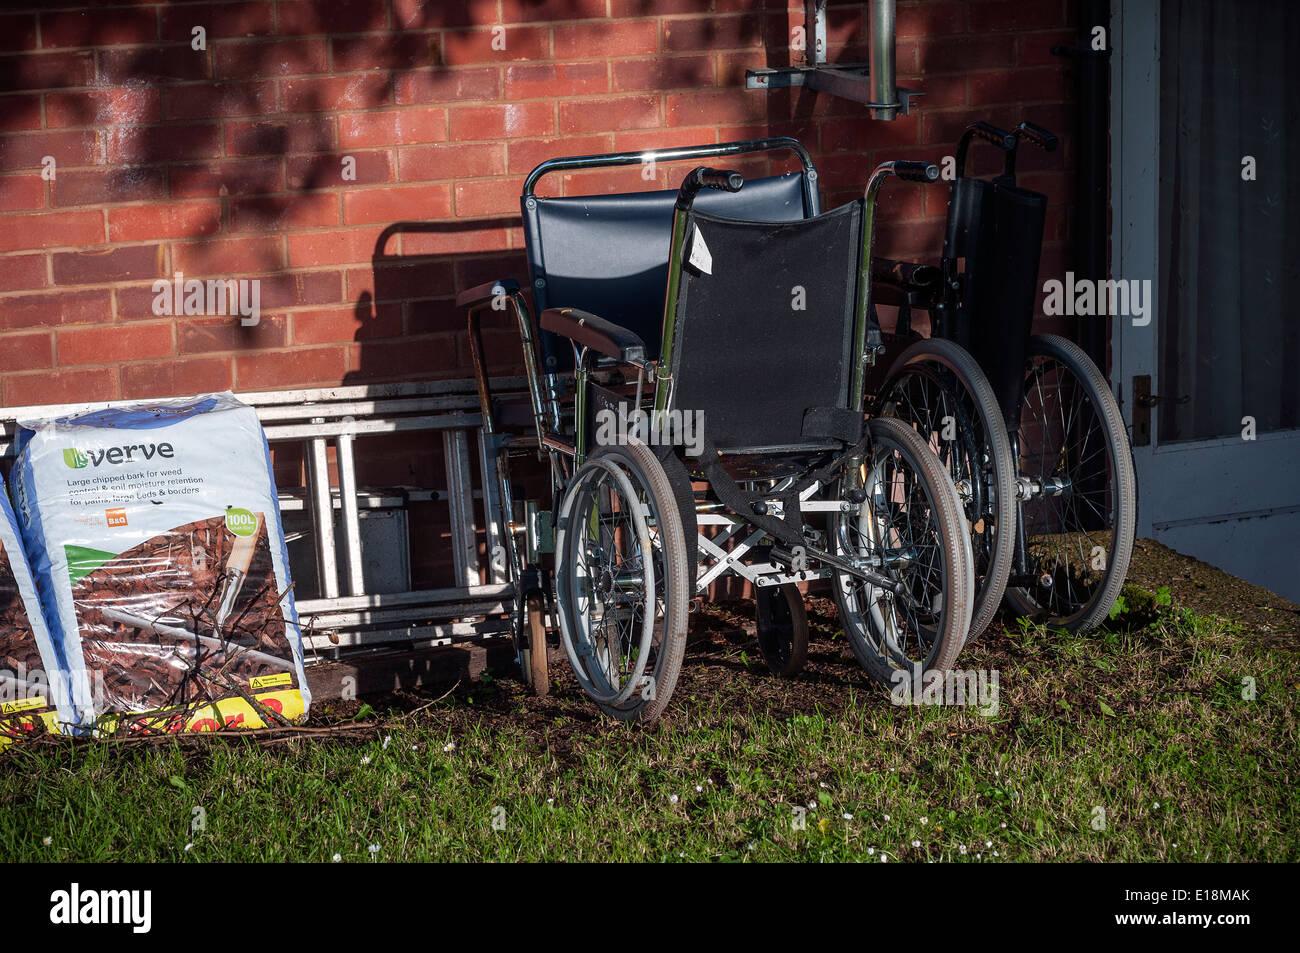 wheelchairs,care home.verve,wheelchair, chair, wheel, handicap, shadow, medical, sick, steel, invalid, circle, seat, Stock Photo